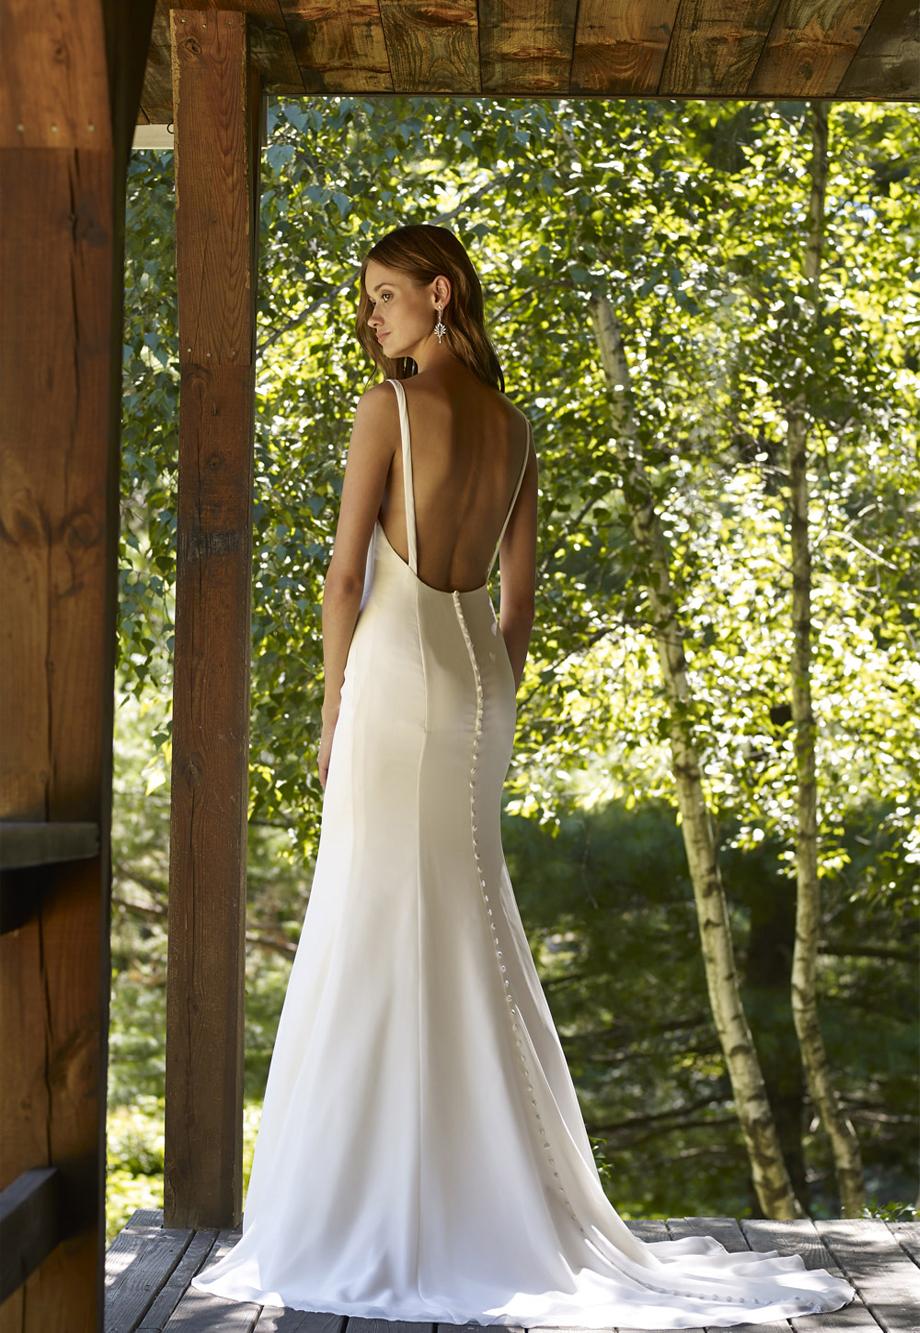 robert bullock wedding dresses photo - 1